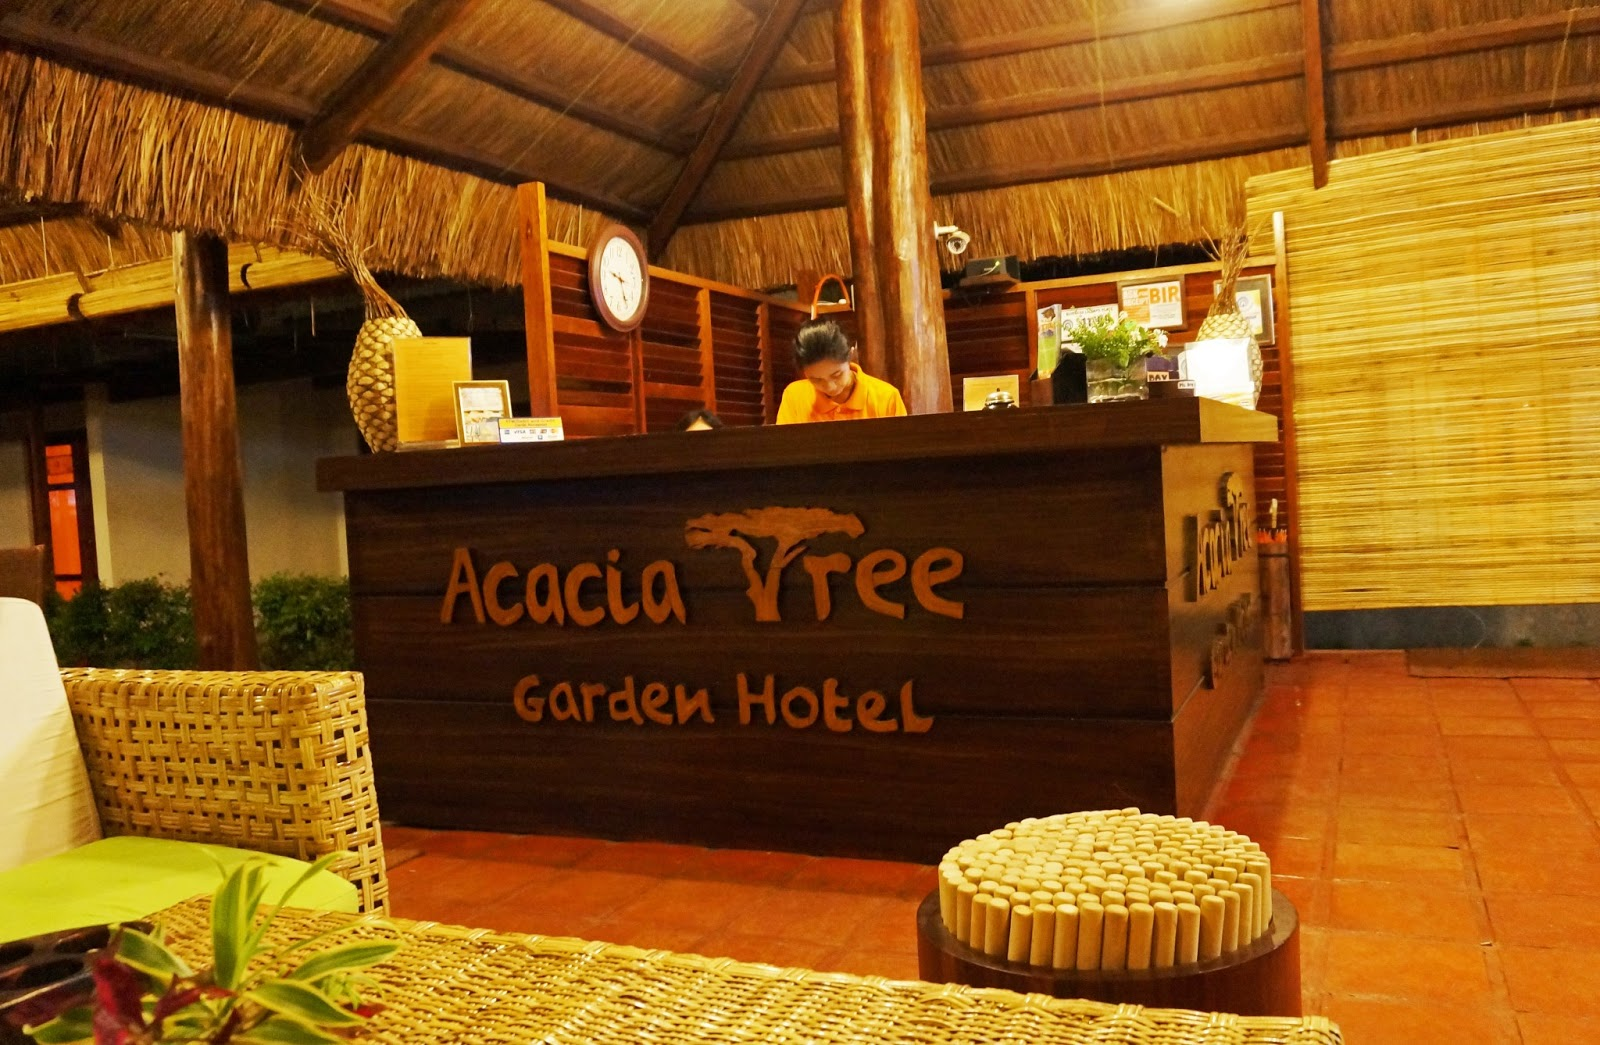 MY PEACH HOUSE Acacia Tree Garden Hotel Review